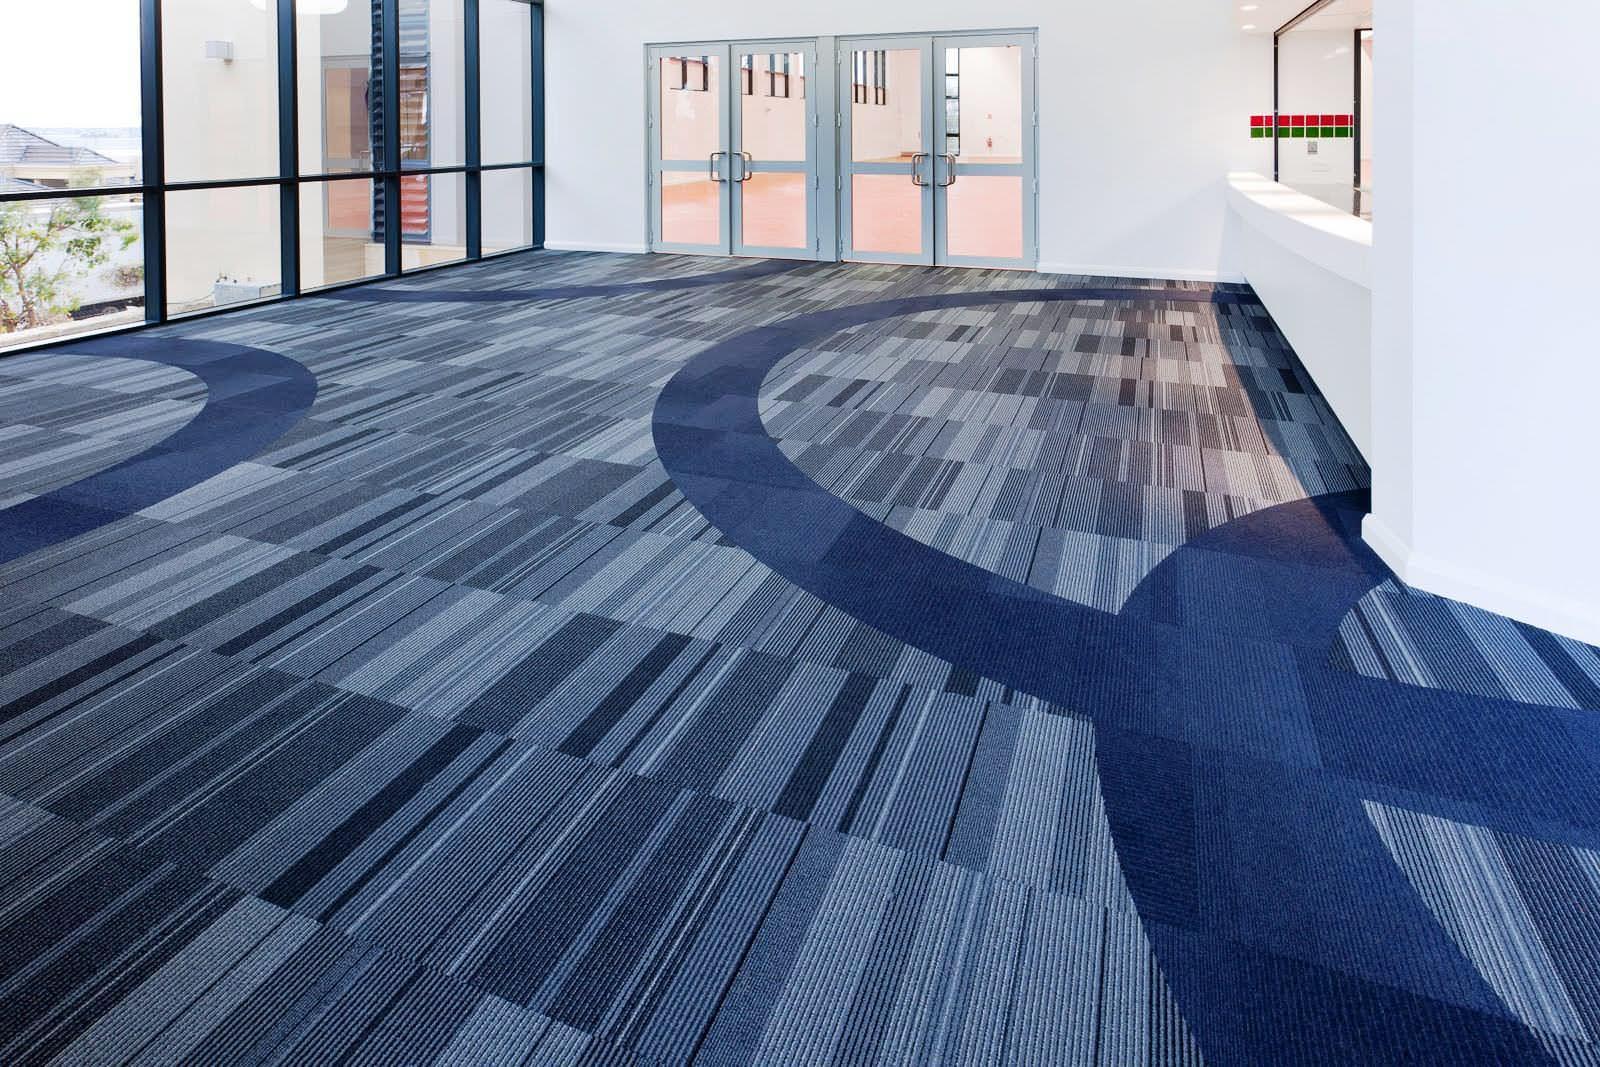 Shaw Berber Carpet Tiles